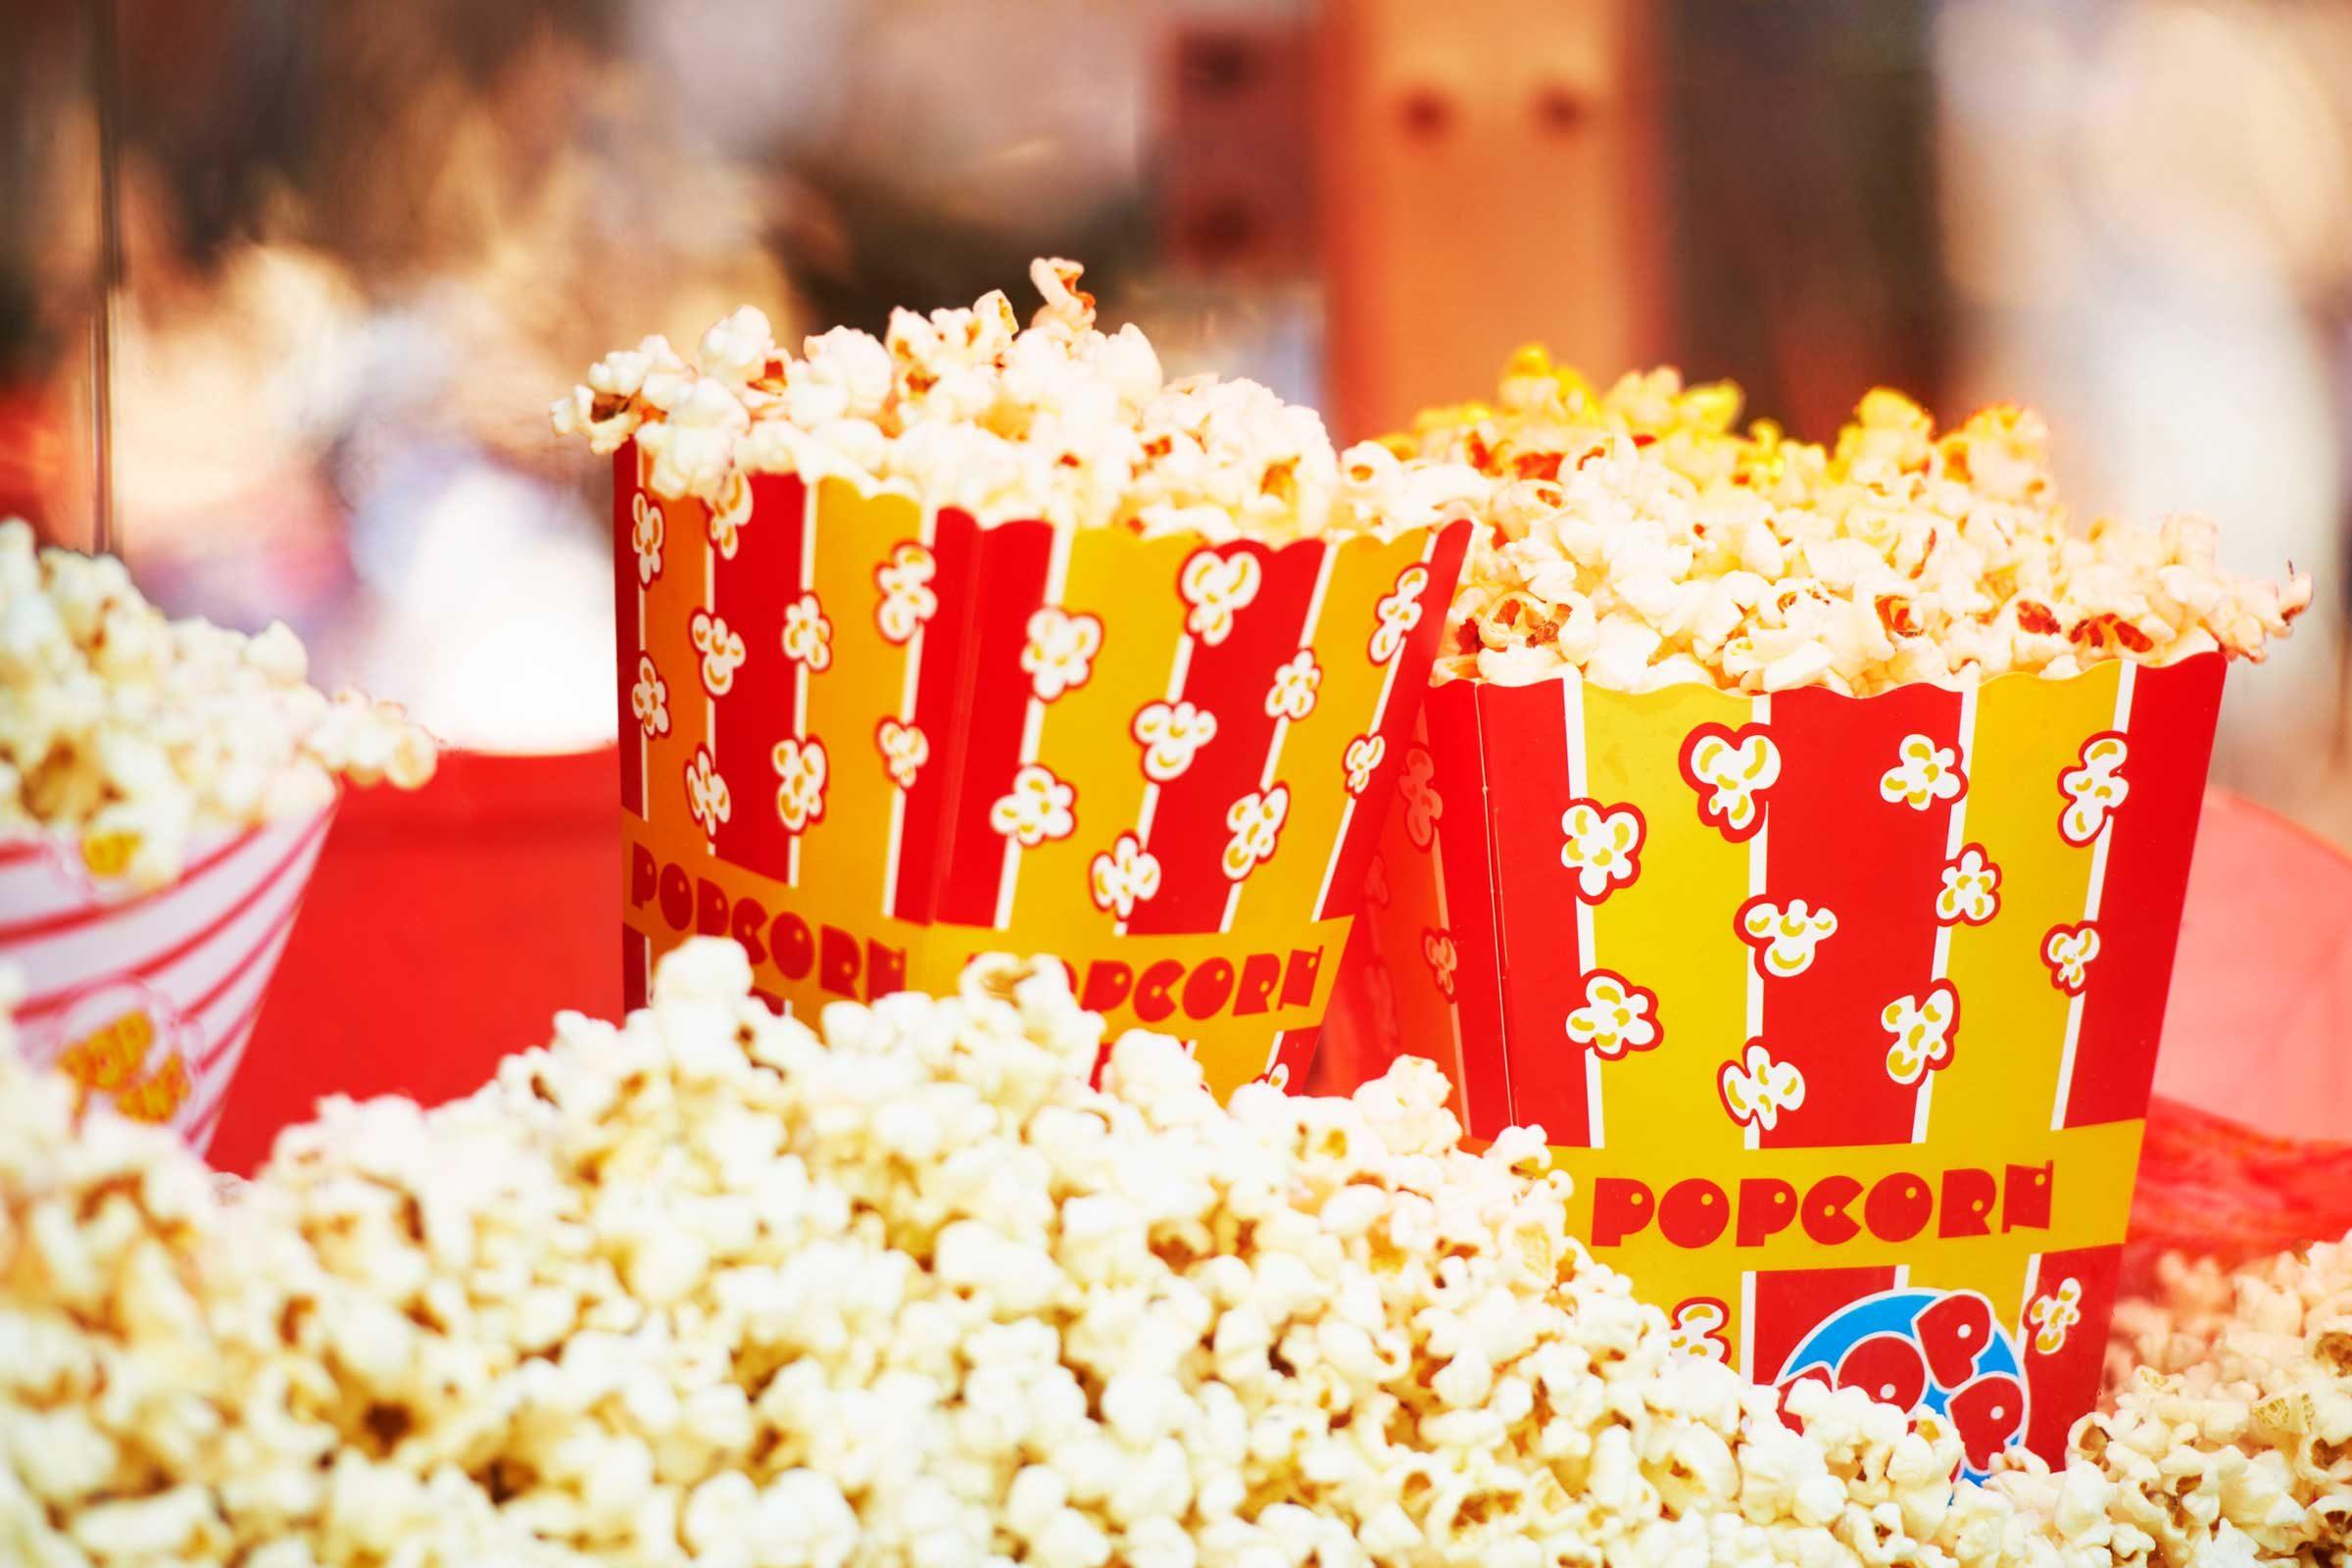 Movie Popcorn Fat 41